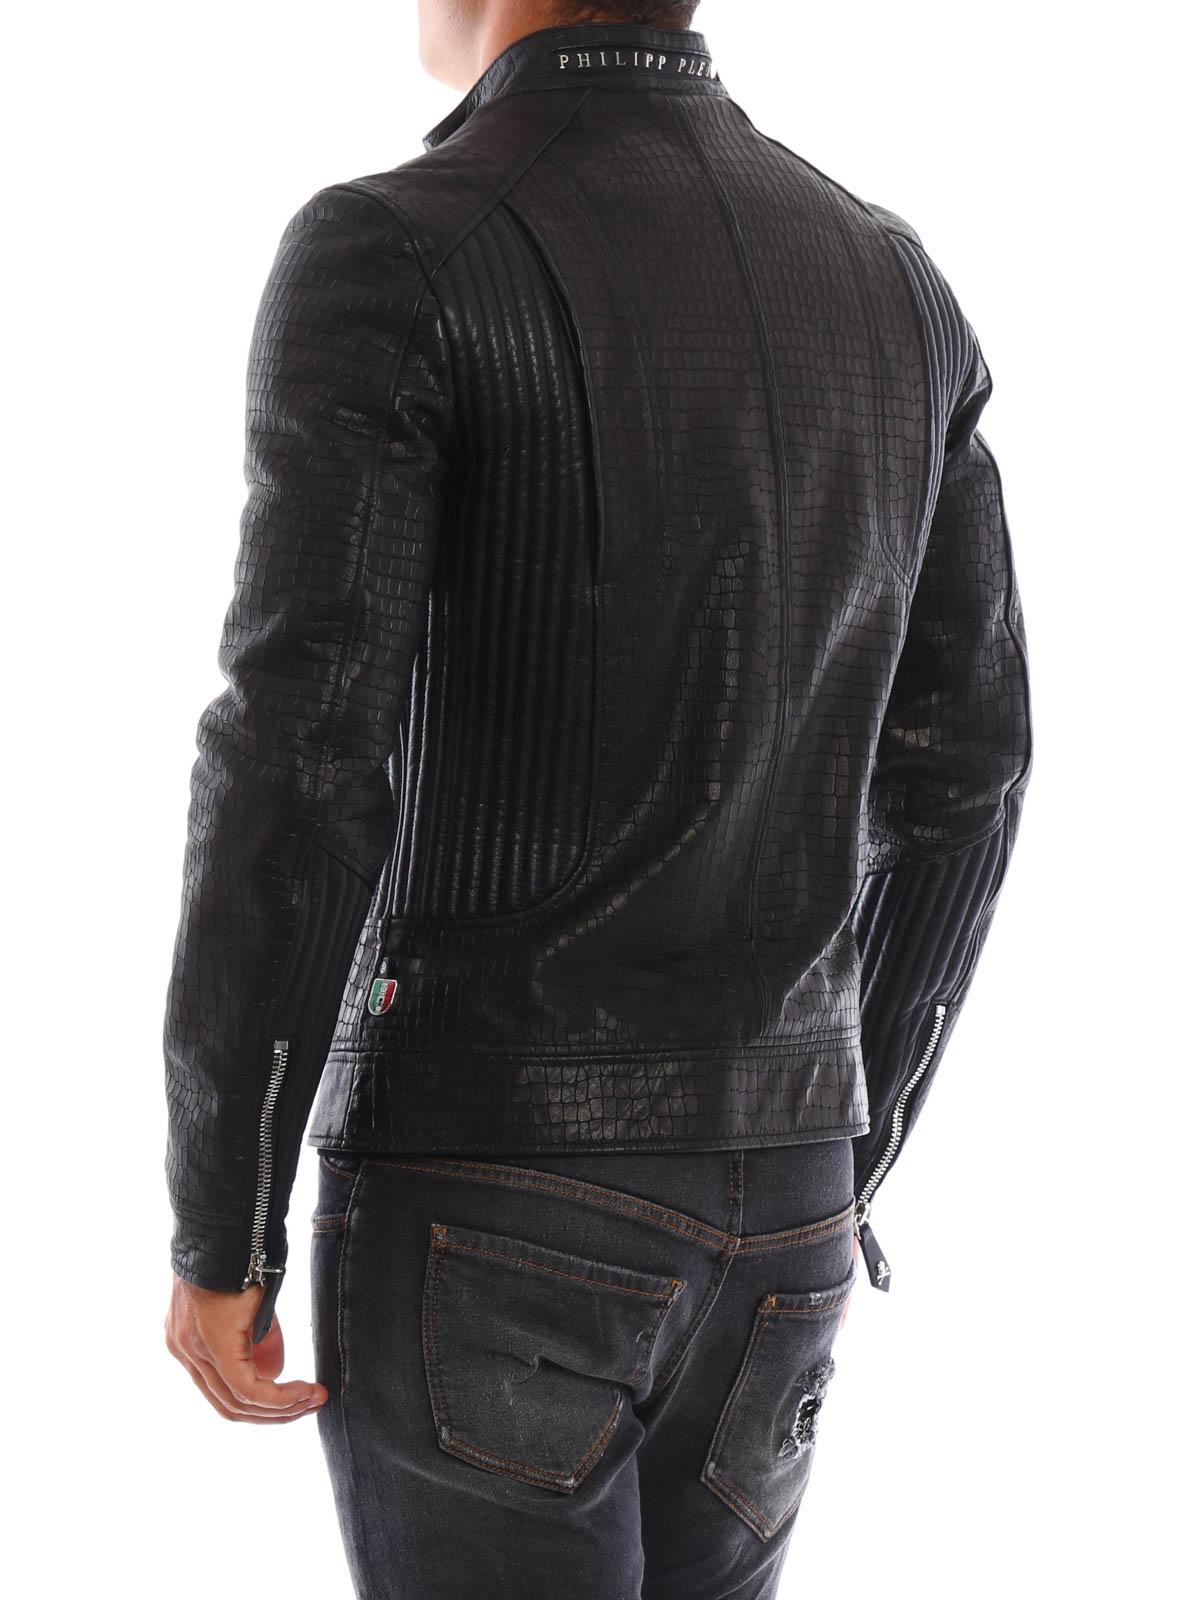 logo printed leather jacket - Black Philipp Plein Clearance Sneakernews p4B4n9am